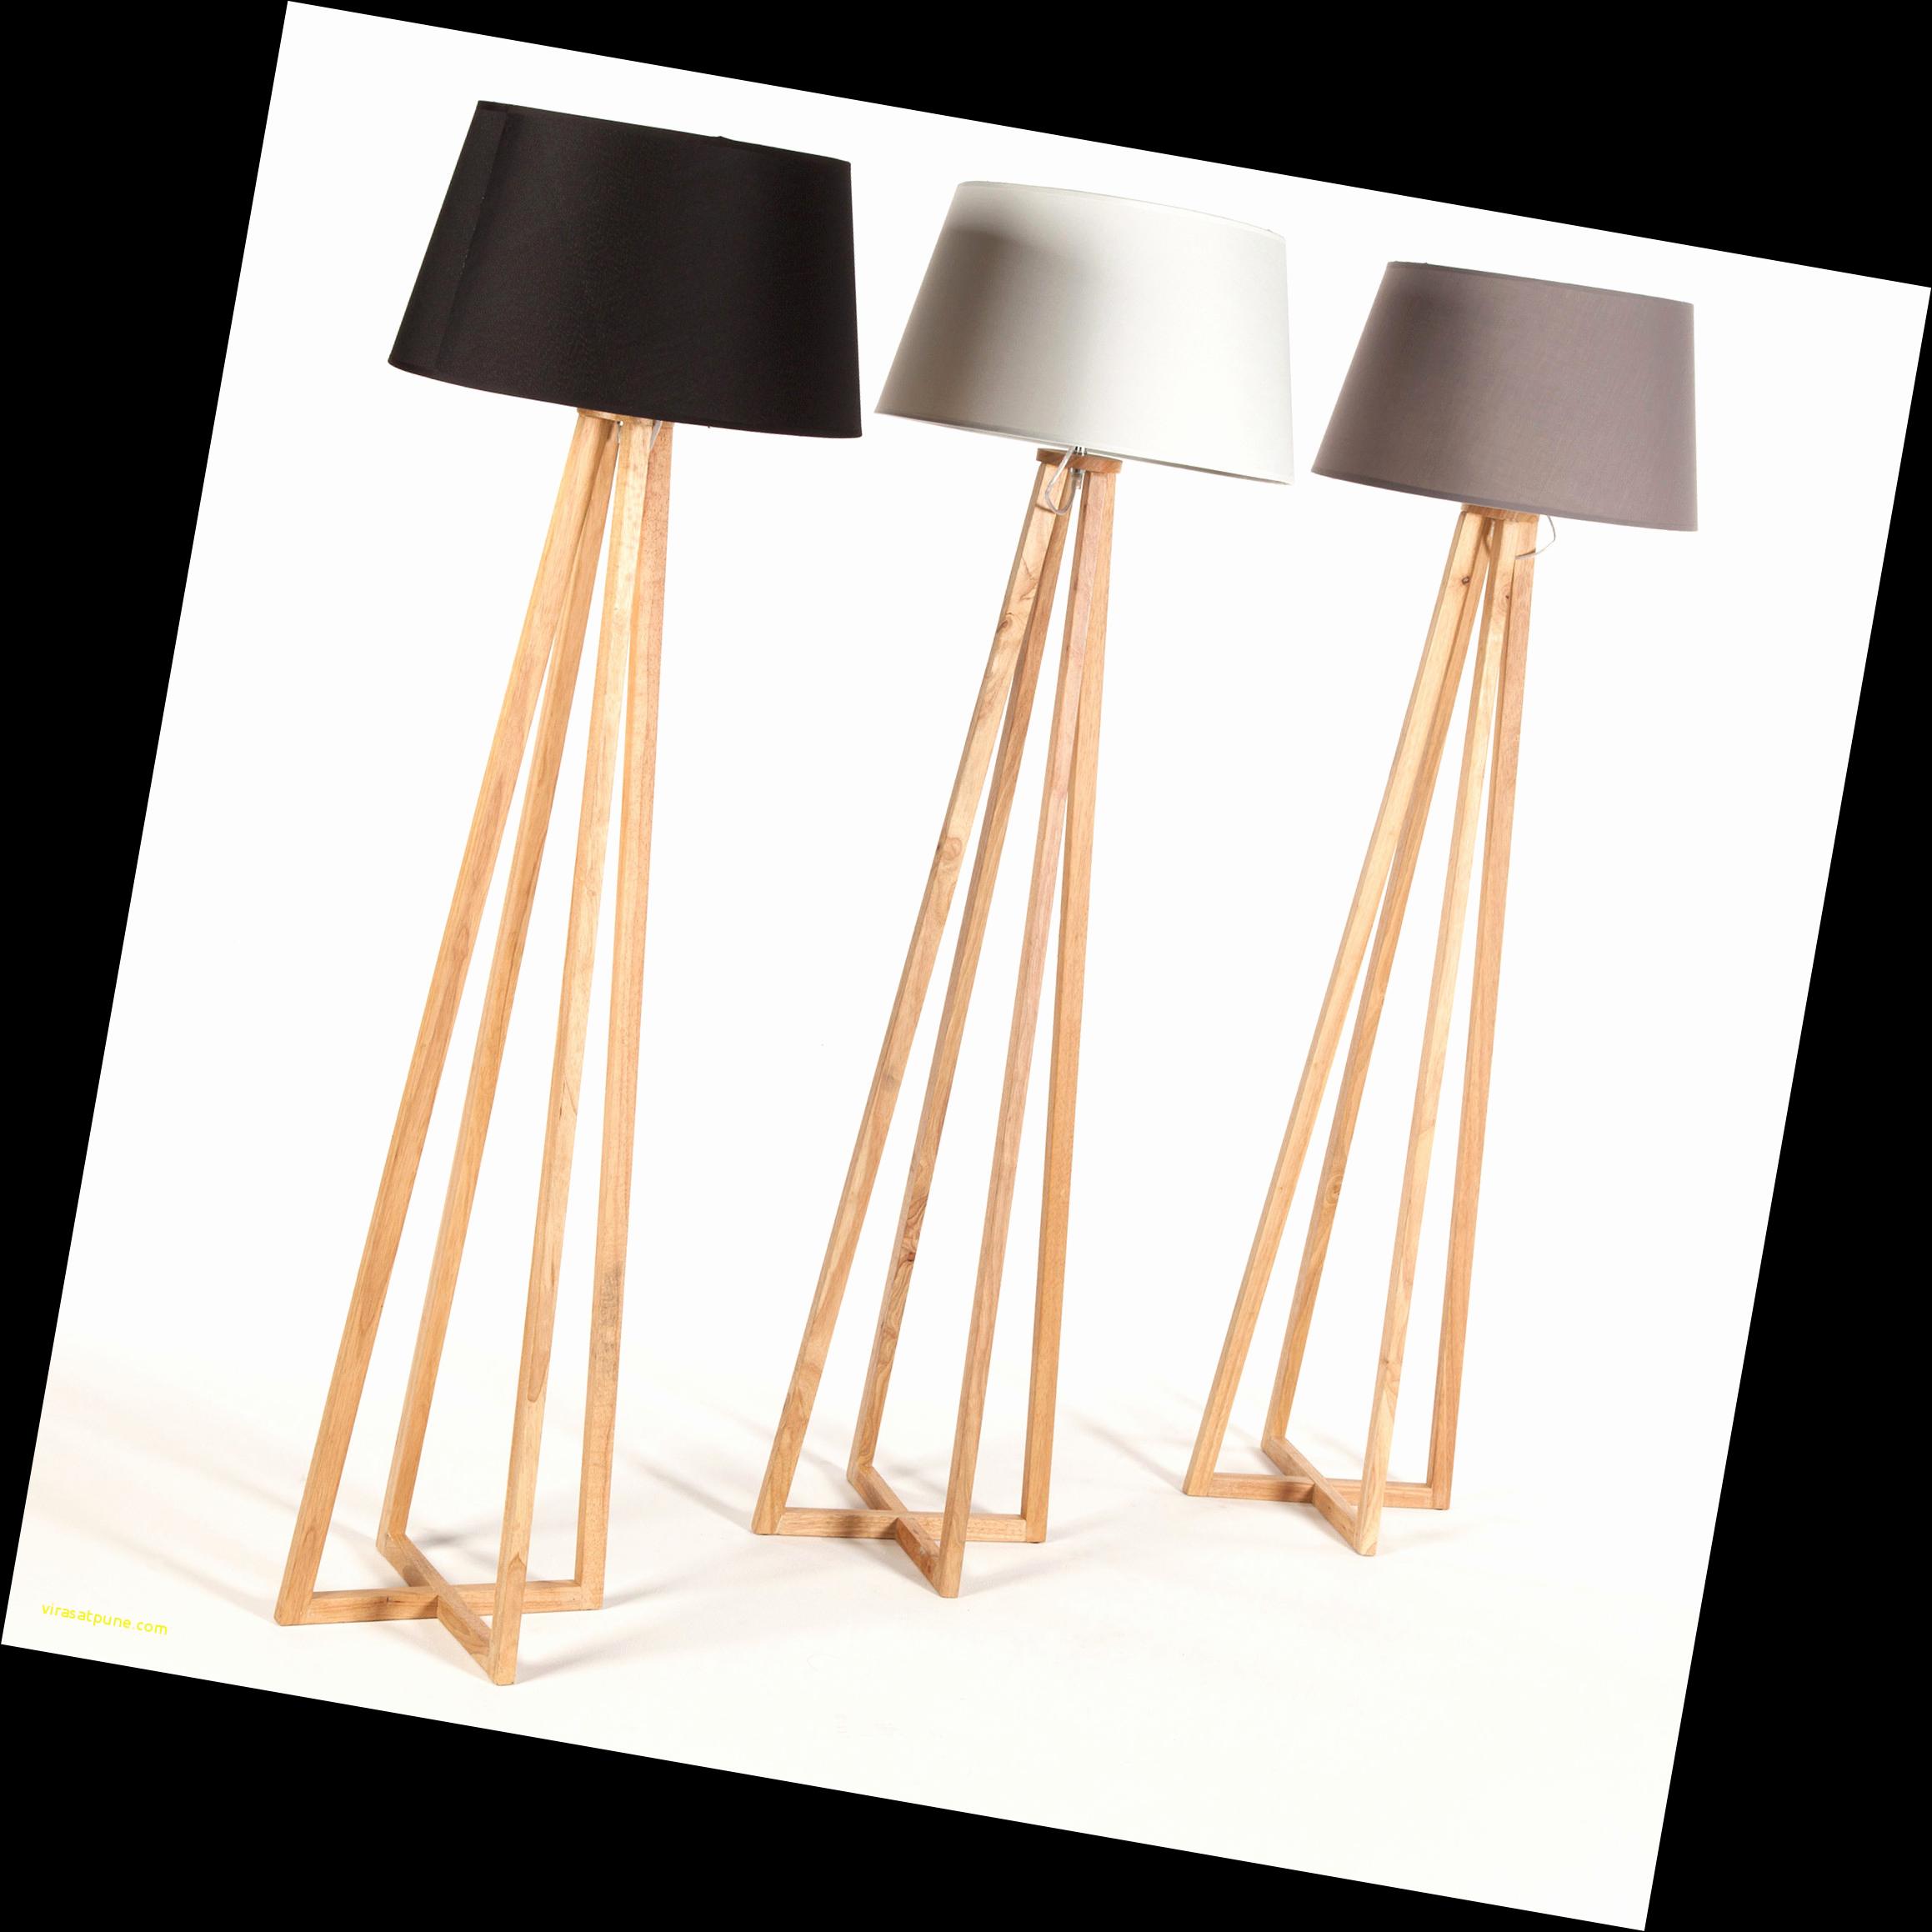 tube neon leroy merlin inspirant grande lampe sur pied haut lustre tendance 0d archives lampadaire scheme de lampe liseuse sur pied of lampe liseuse sur pied of tube neon leroy merlin